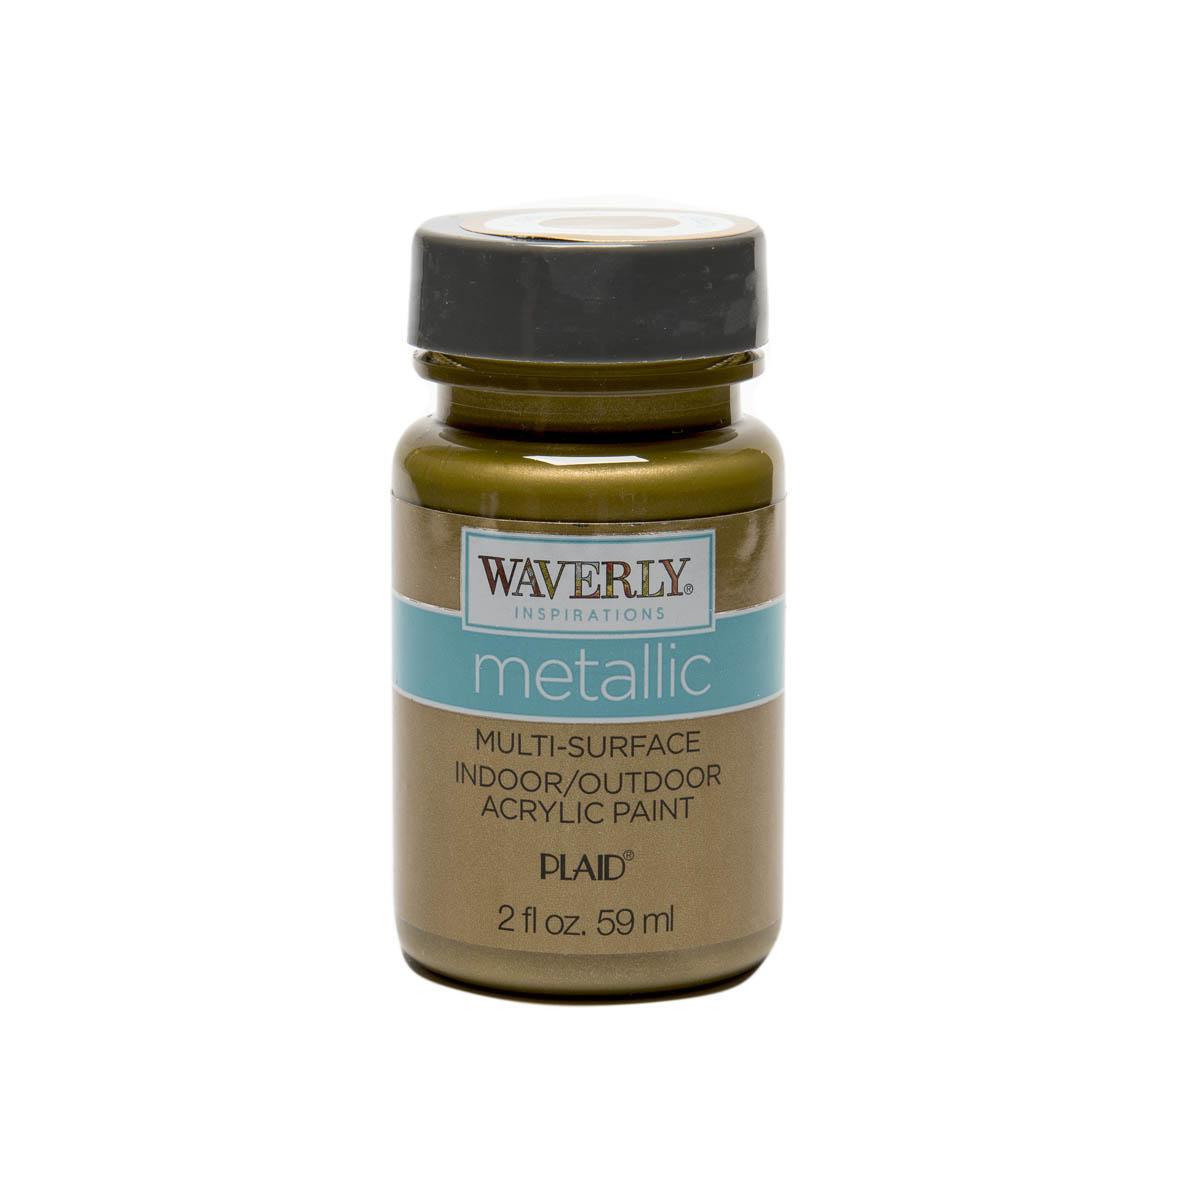 Waverly ® Inspirations Metallic Multi-Surface Acrylic Paint - Golden, 2 oz.